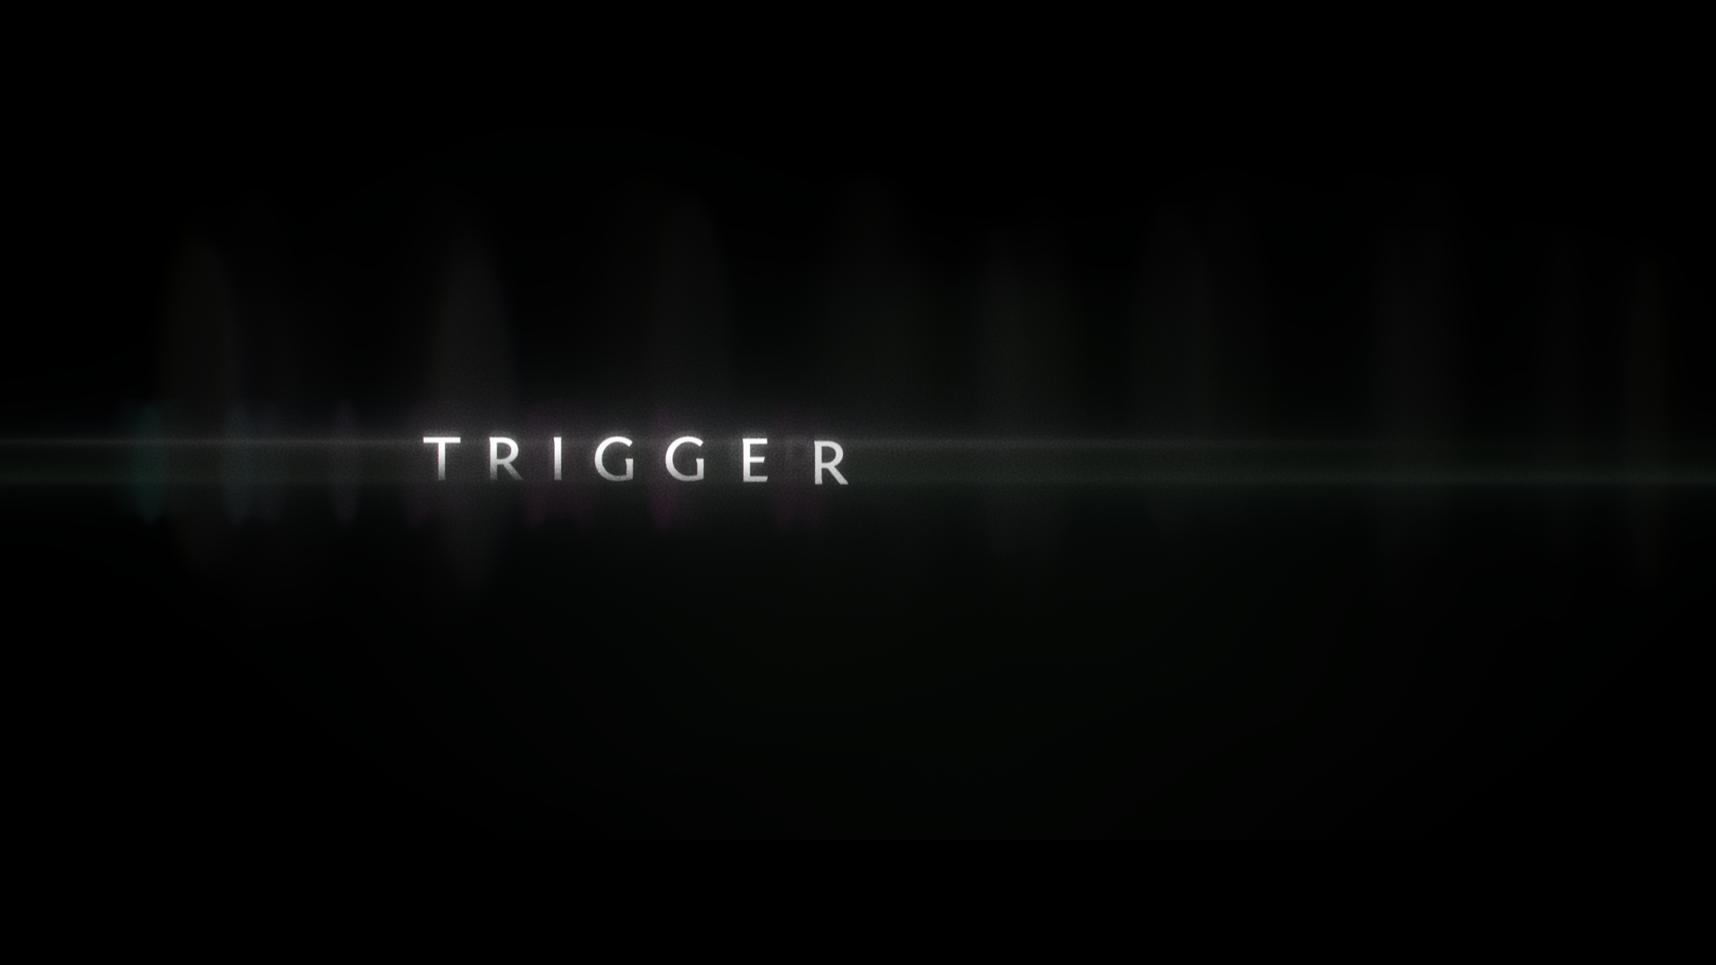 trigger_title_2.png